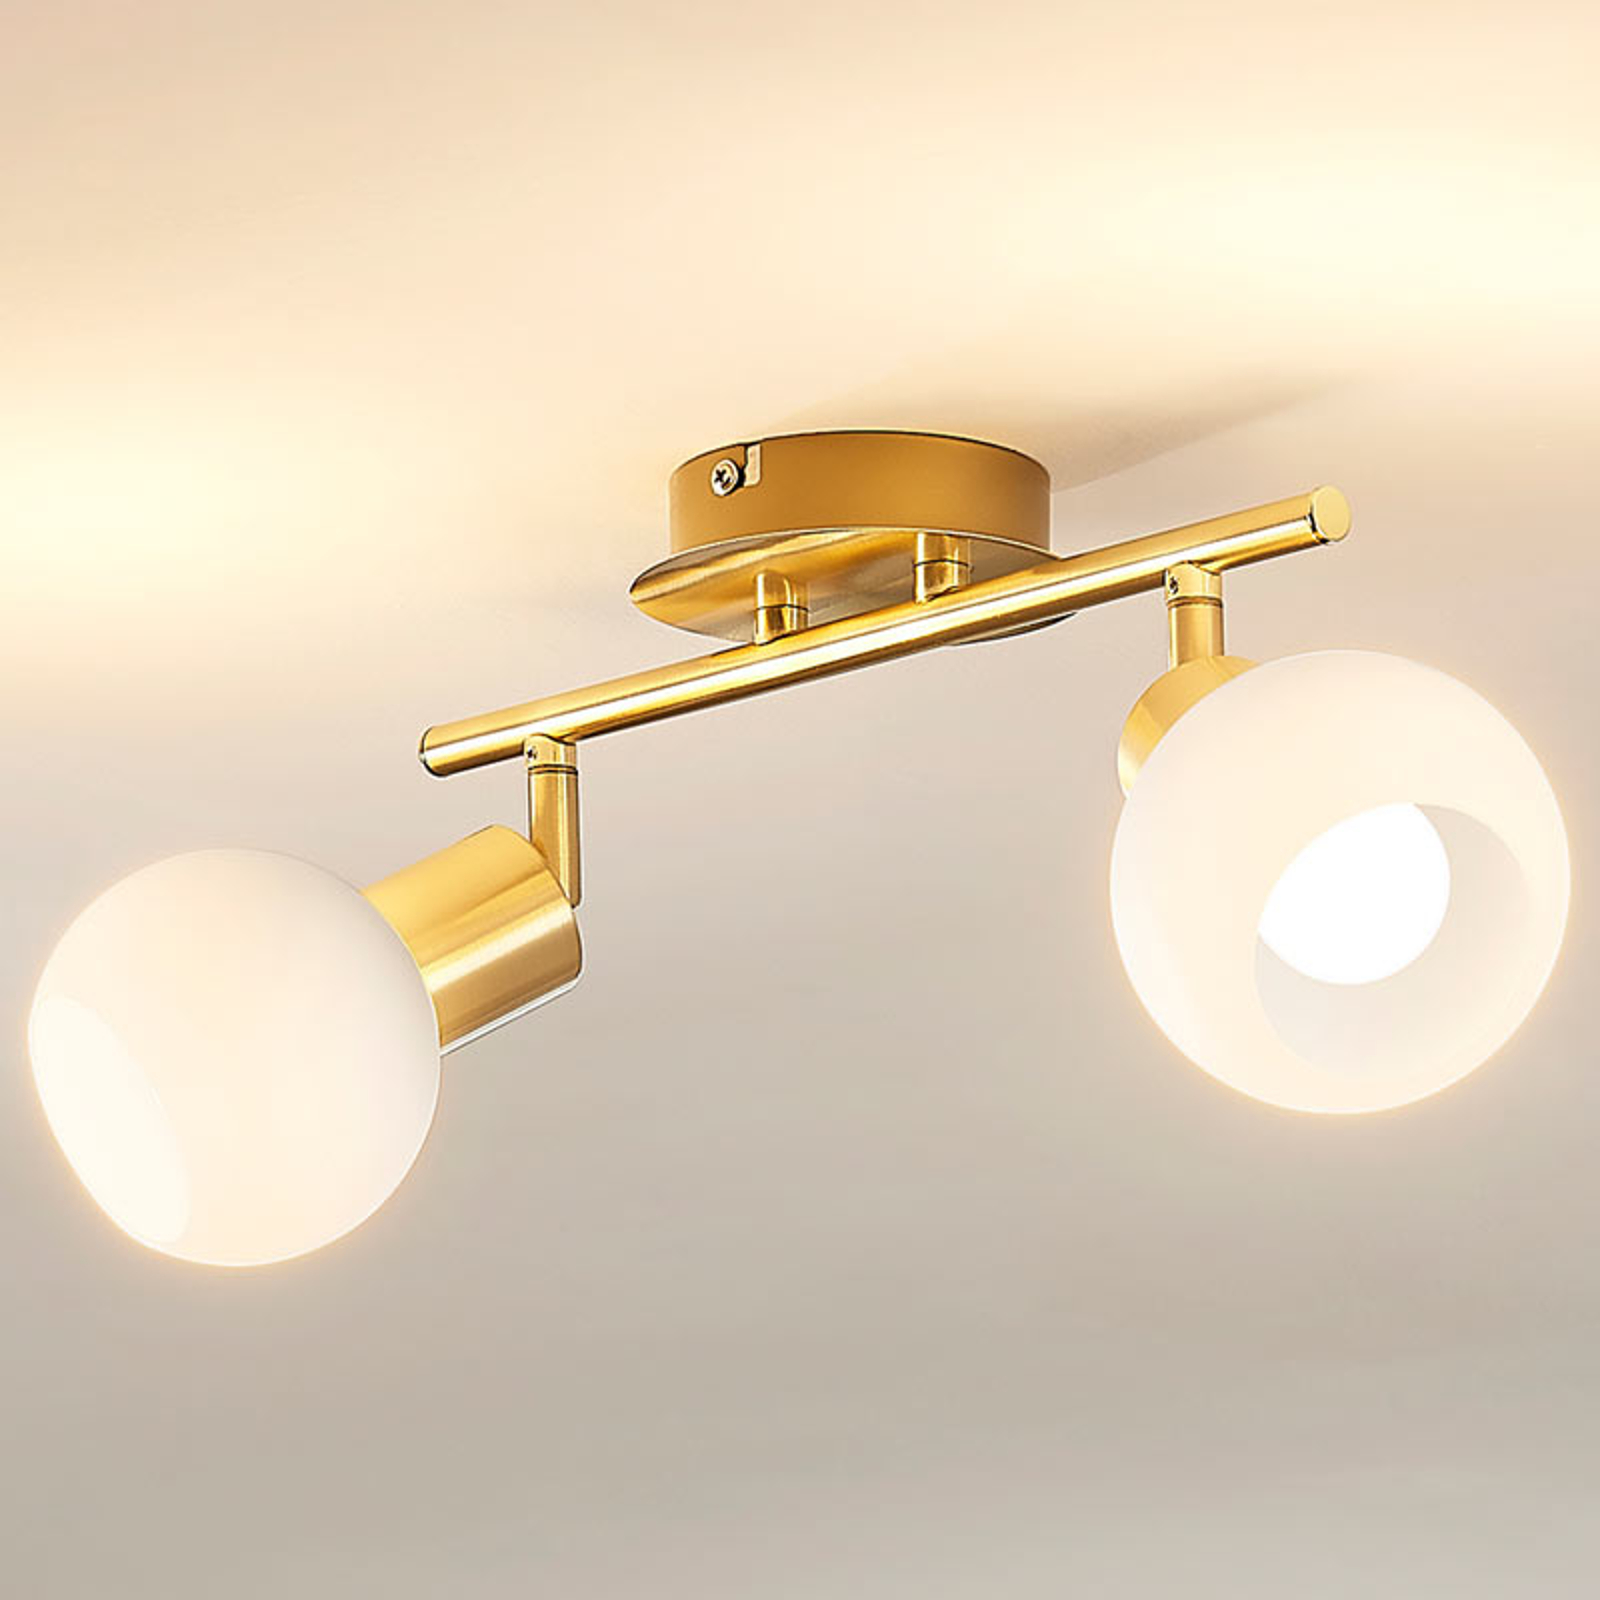 LED-Deckenlampe Elaina 2-flg., messing